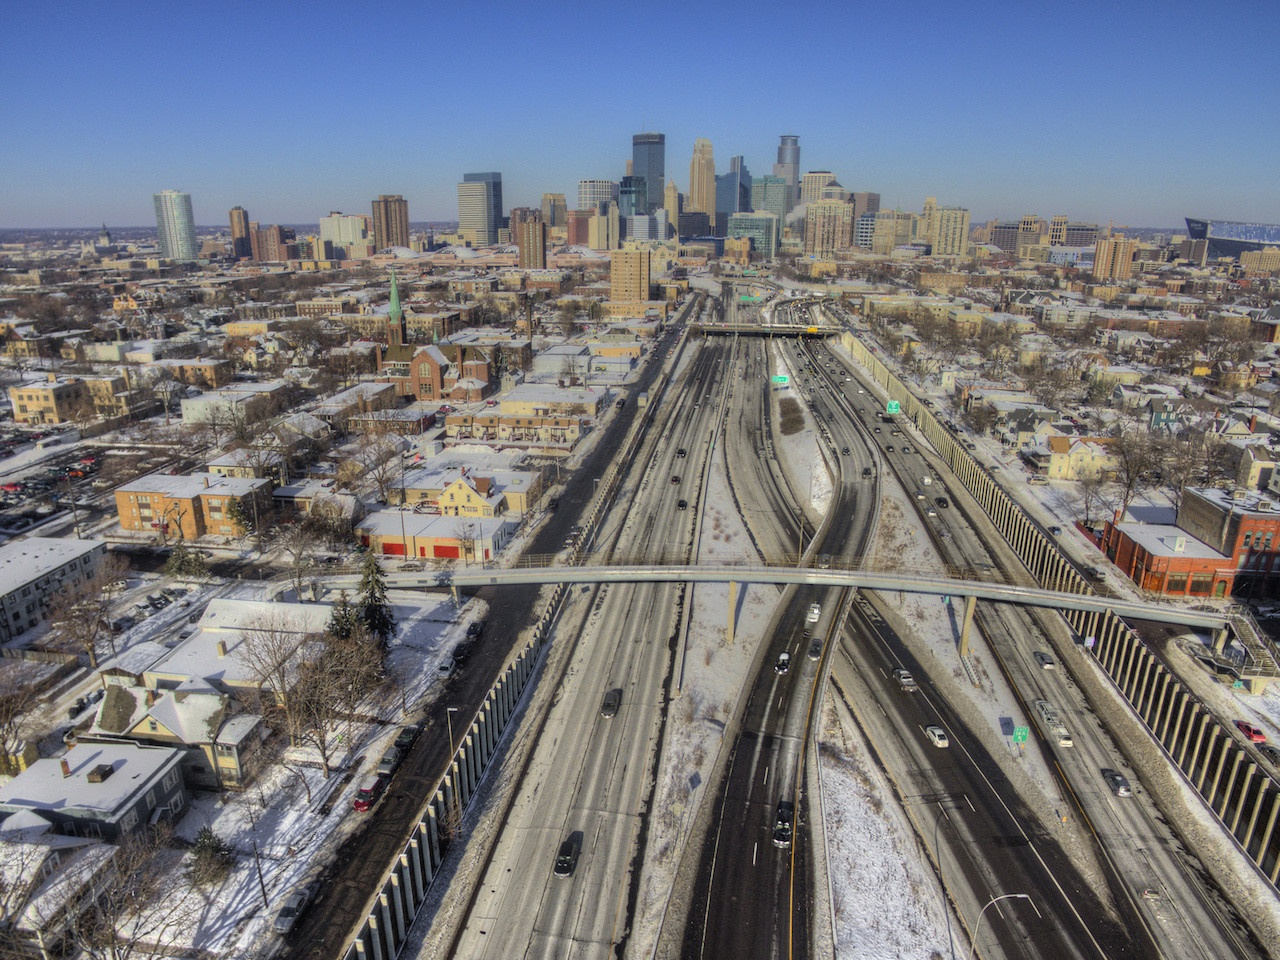 Power Struggle for Aggressive Urban Renewable Energy Goals